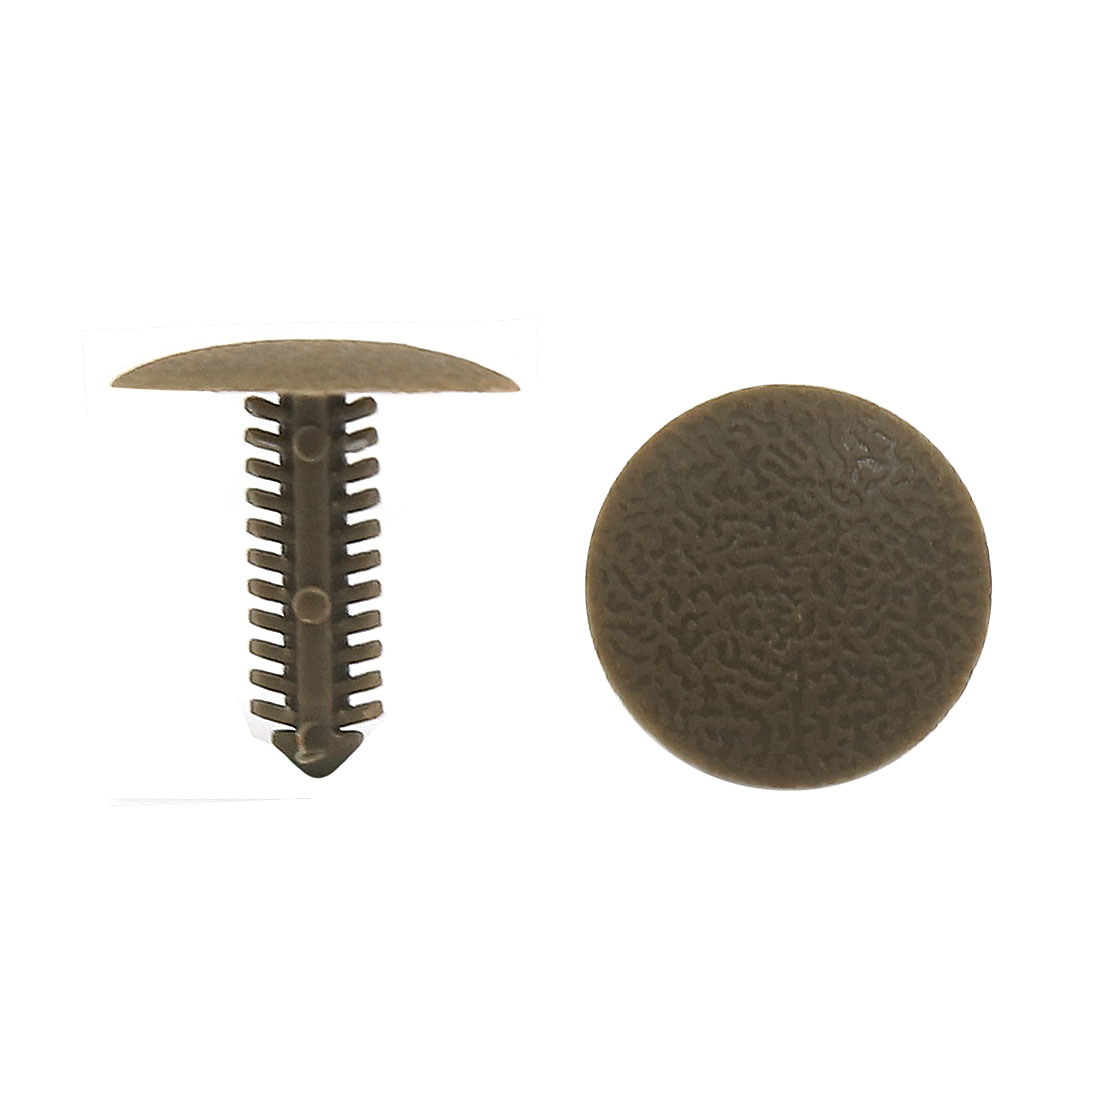 100 Pcs Deep Gray Bumper Fender 6mm Hole Plastic Rivets Fasteners for Car Auto